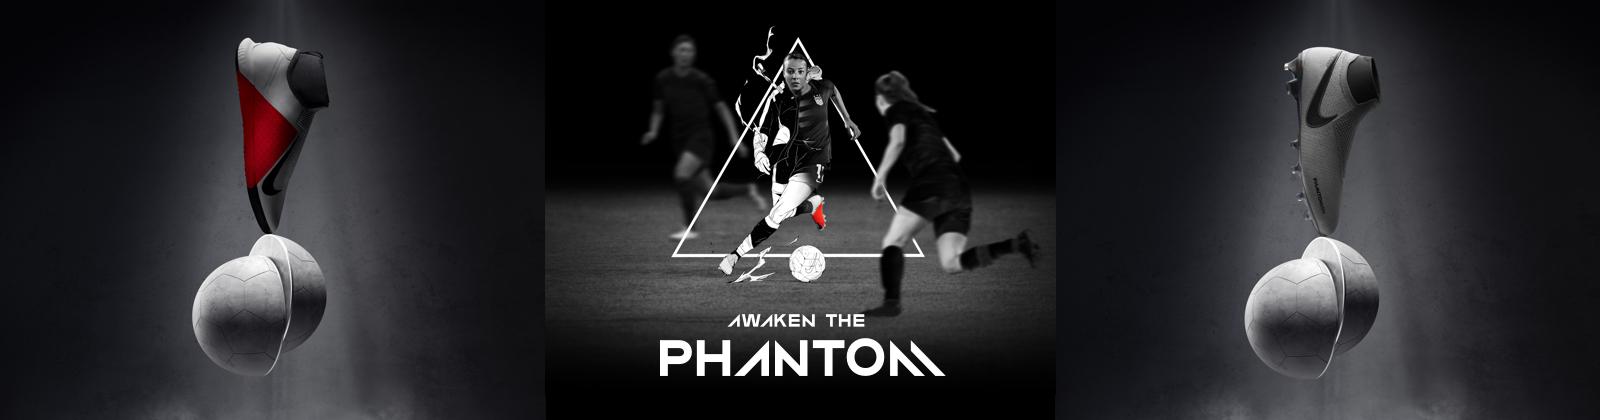 trolebús barco Adentro  Nike Academy - Phantom Elite Coaching 16+ | Nike